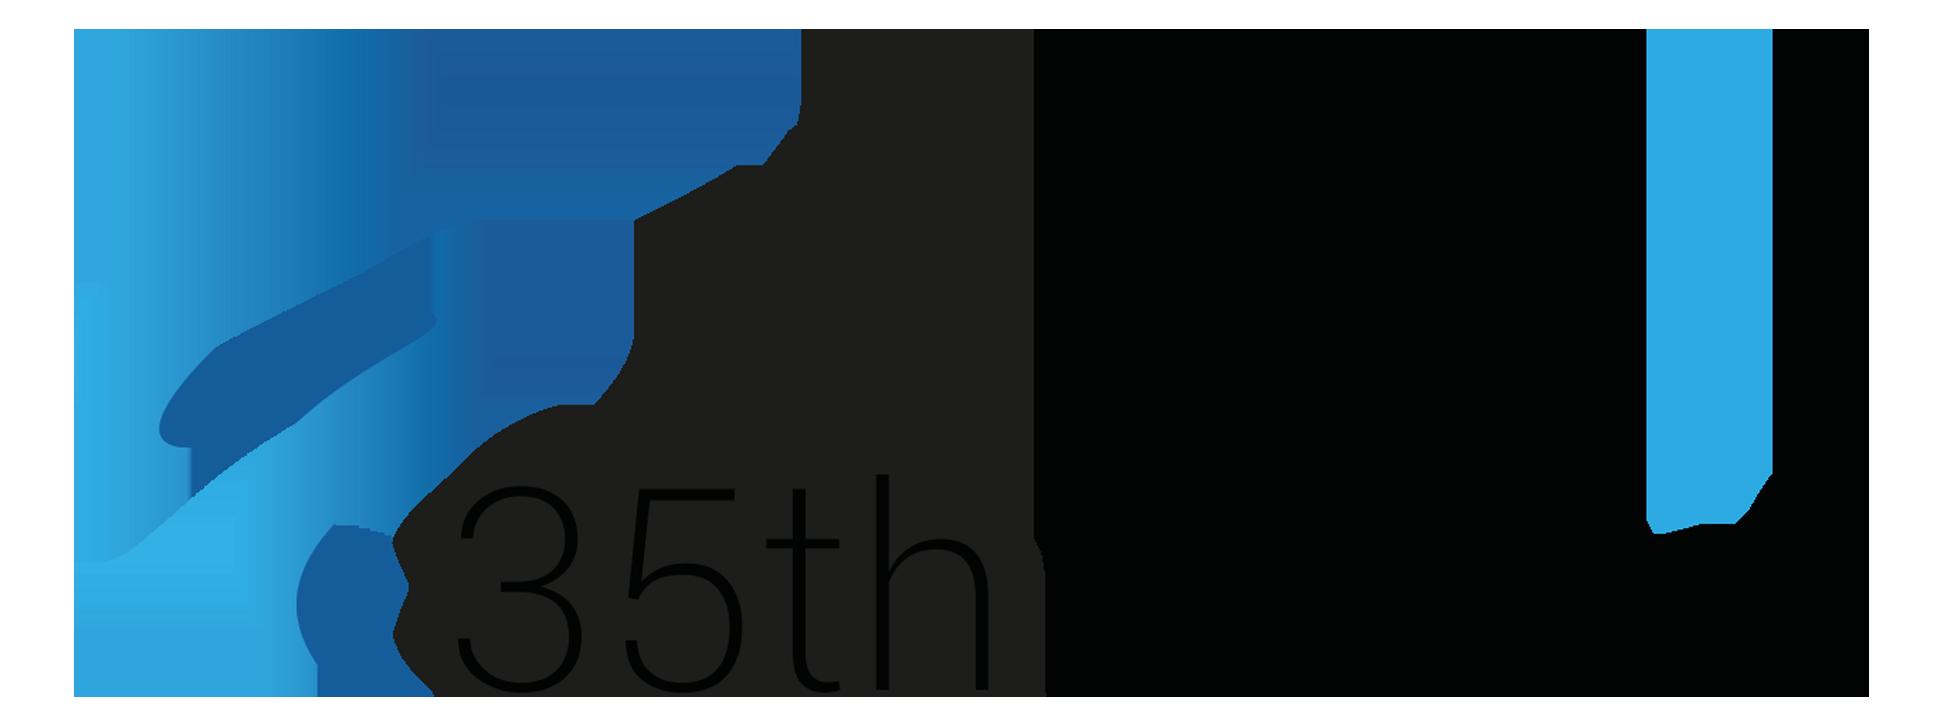 35thmedia logo